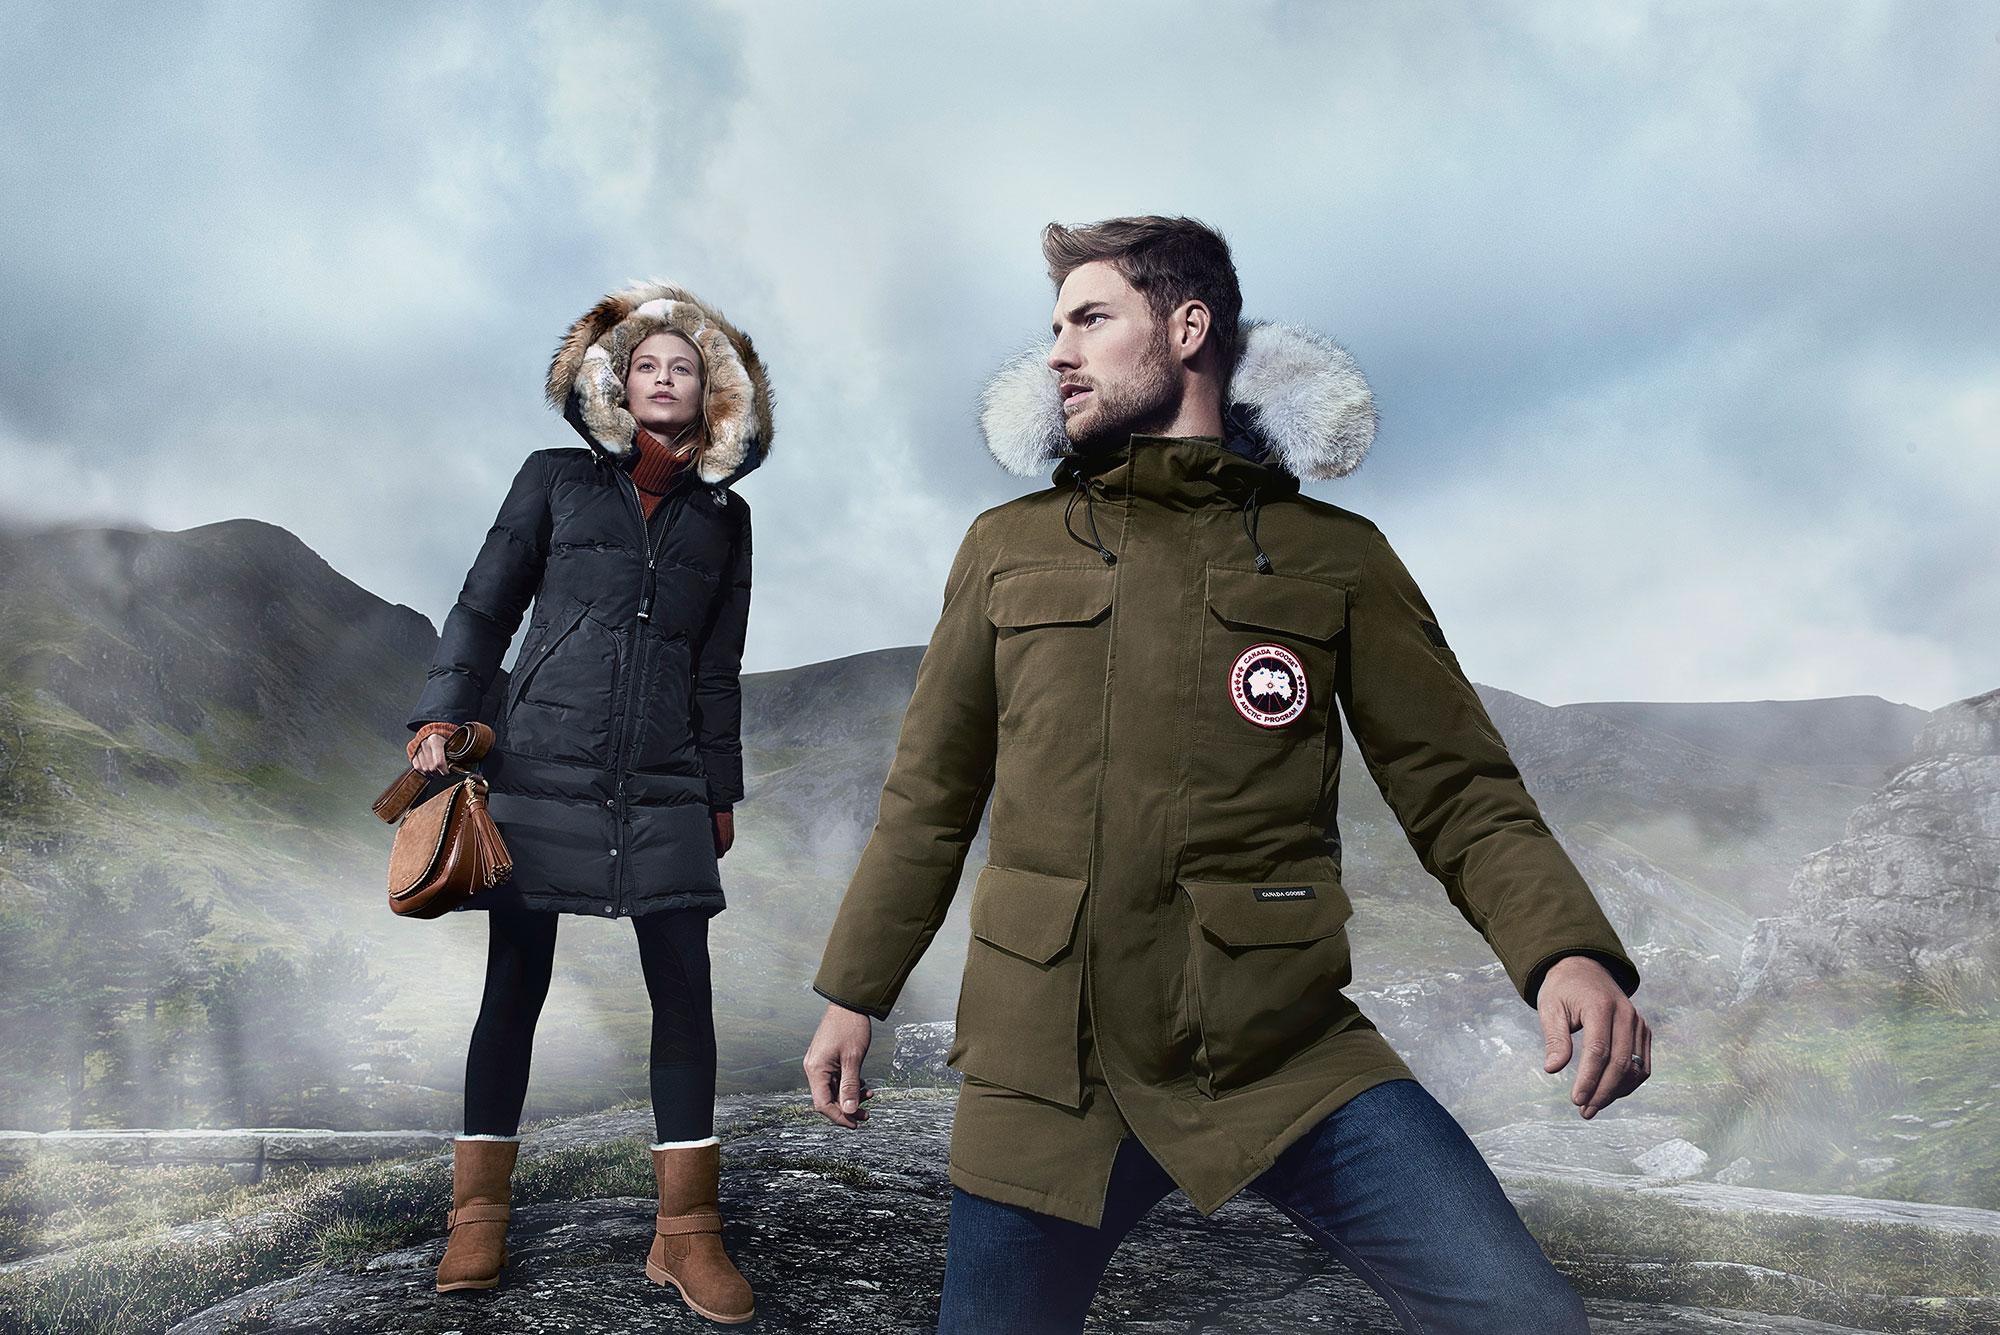 Tessuti-fashion-campaign-couple-canada-goose-jacket-2000px-wide